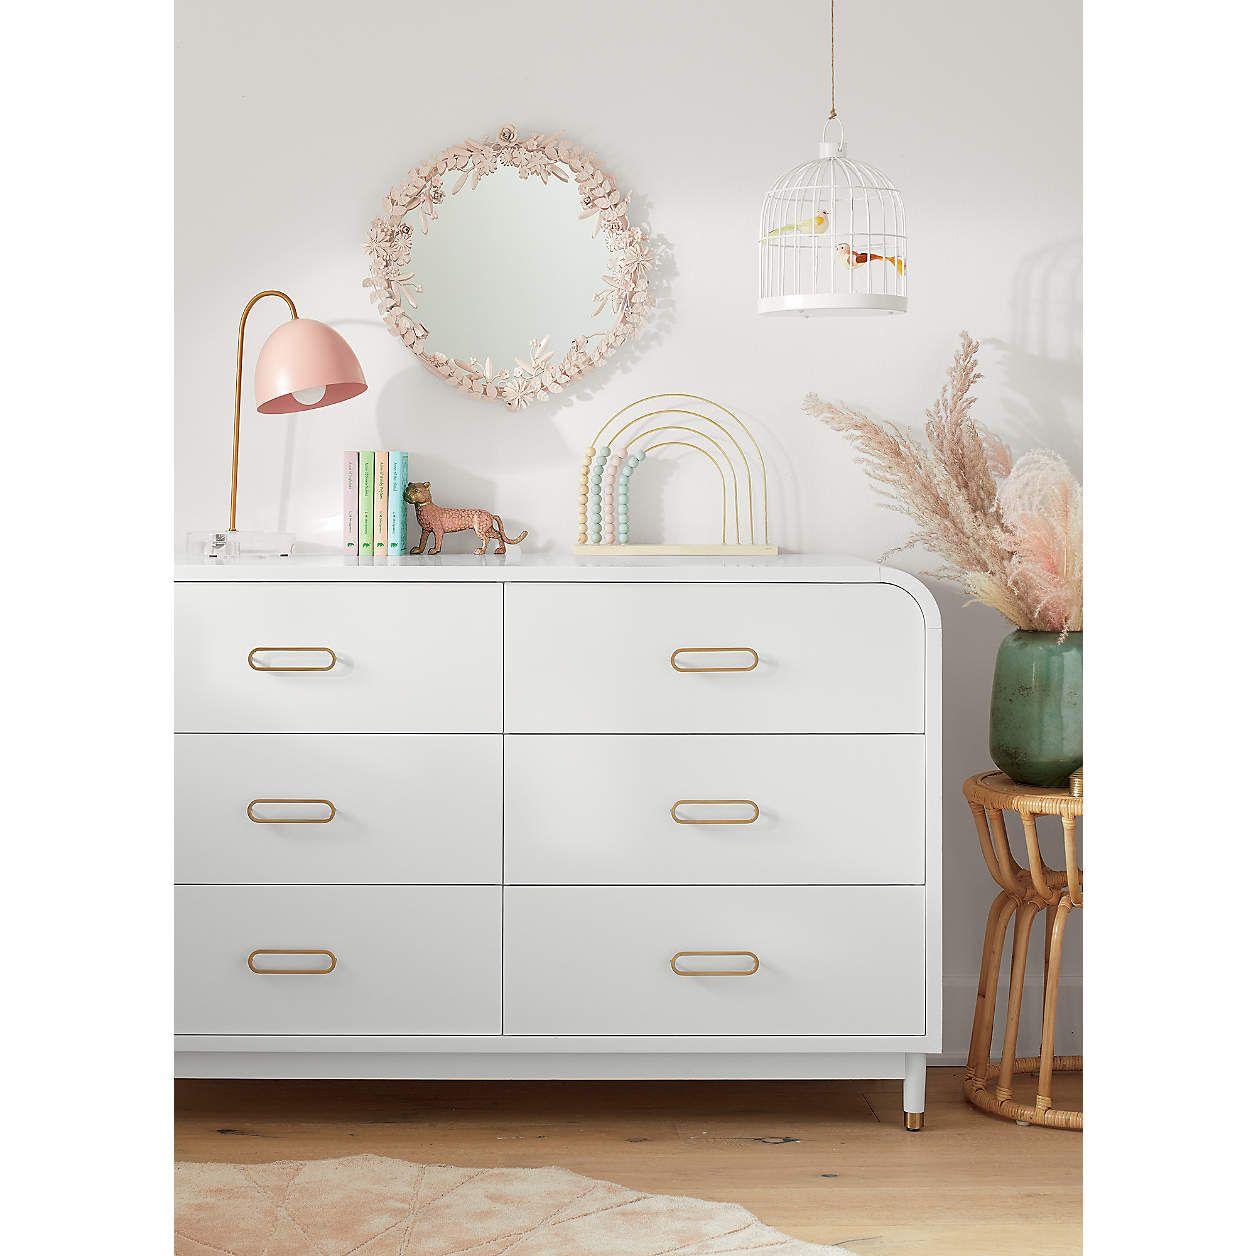 Kids Arlo Wide White And Gold Dresser Reviews Crate And Barrel In 2021 White And Gold Dresser Gold Dresser Kids Furniture Dresser [ 1256 x 1256 Pixel ]